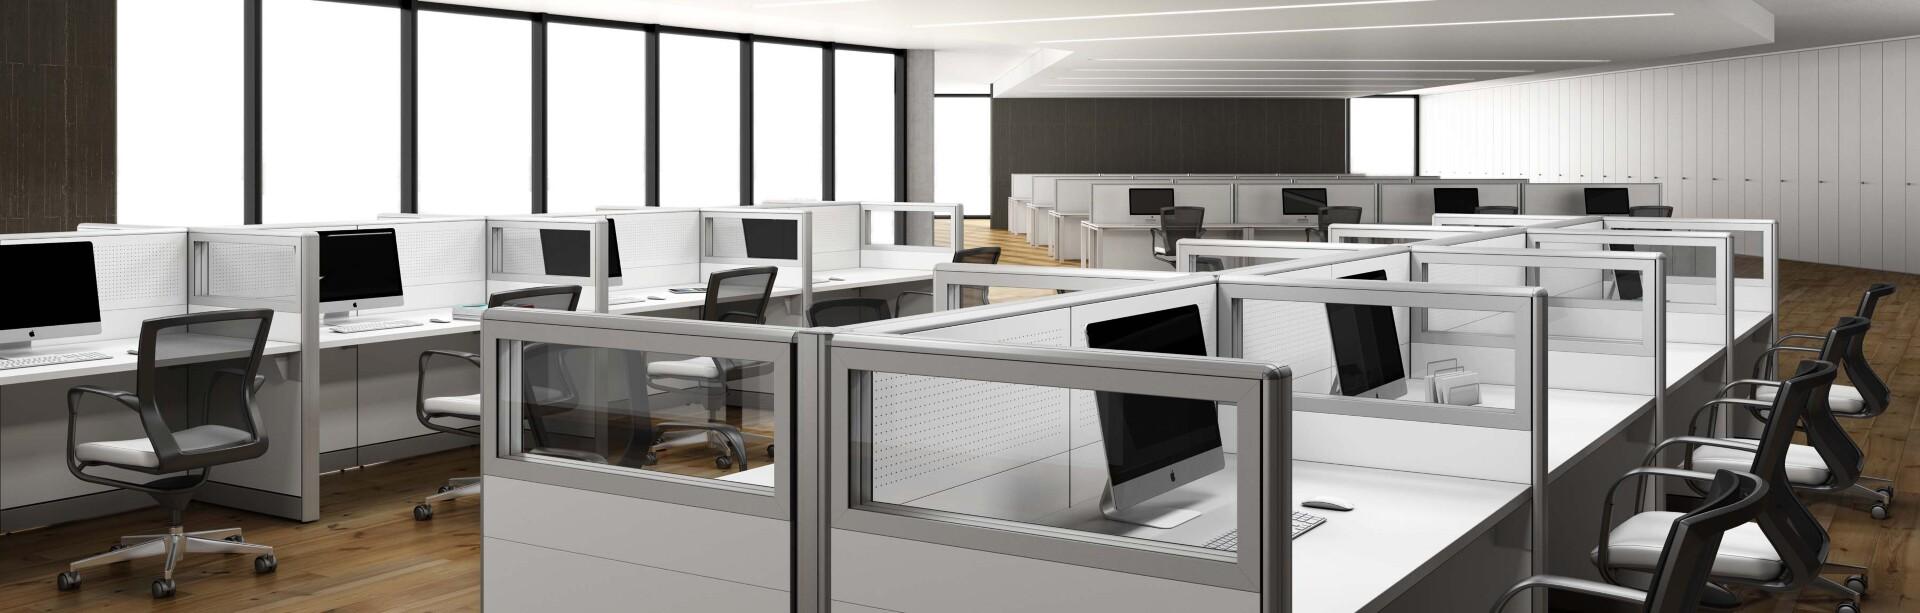 kubi-glass-panel-desking-system-open-space-partition.jpg